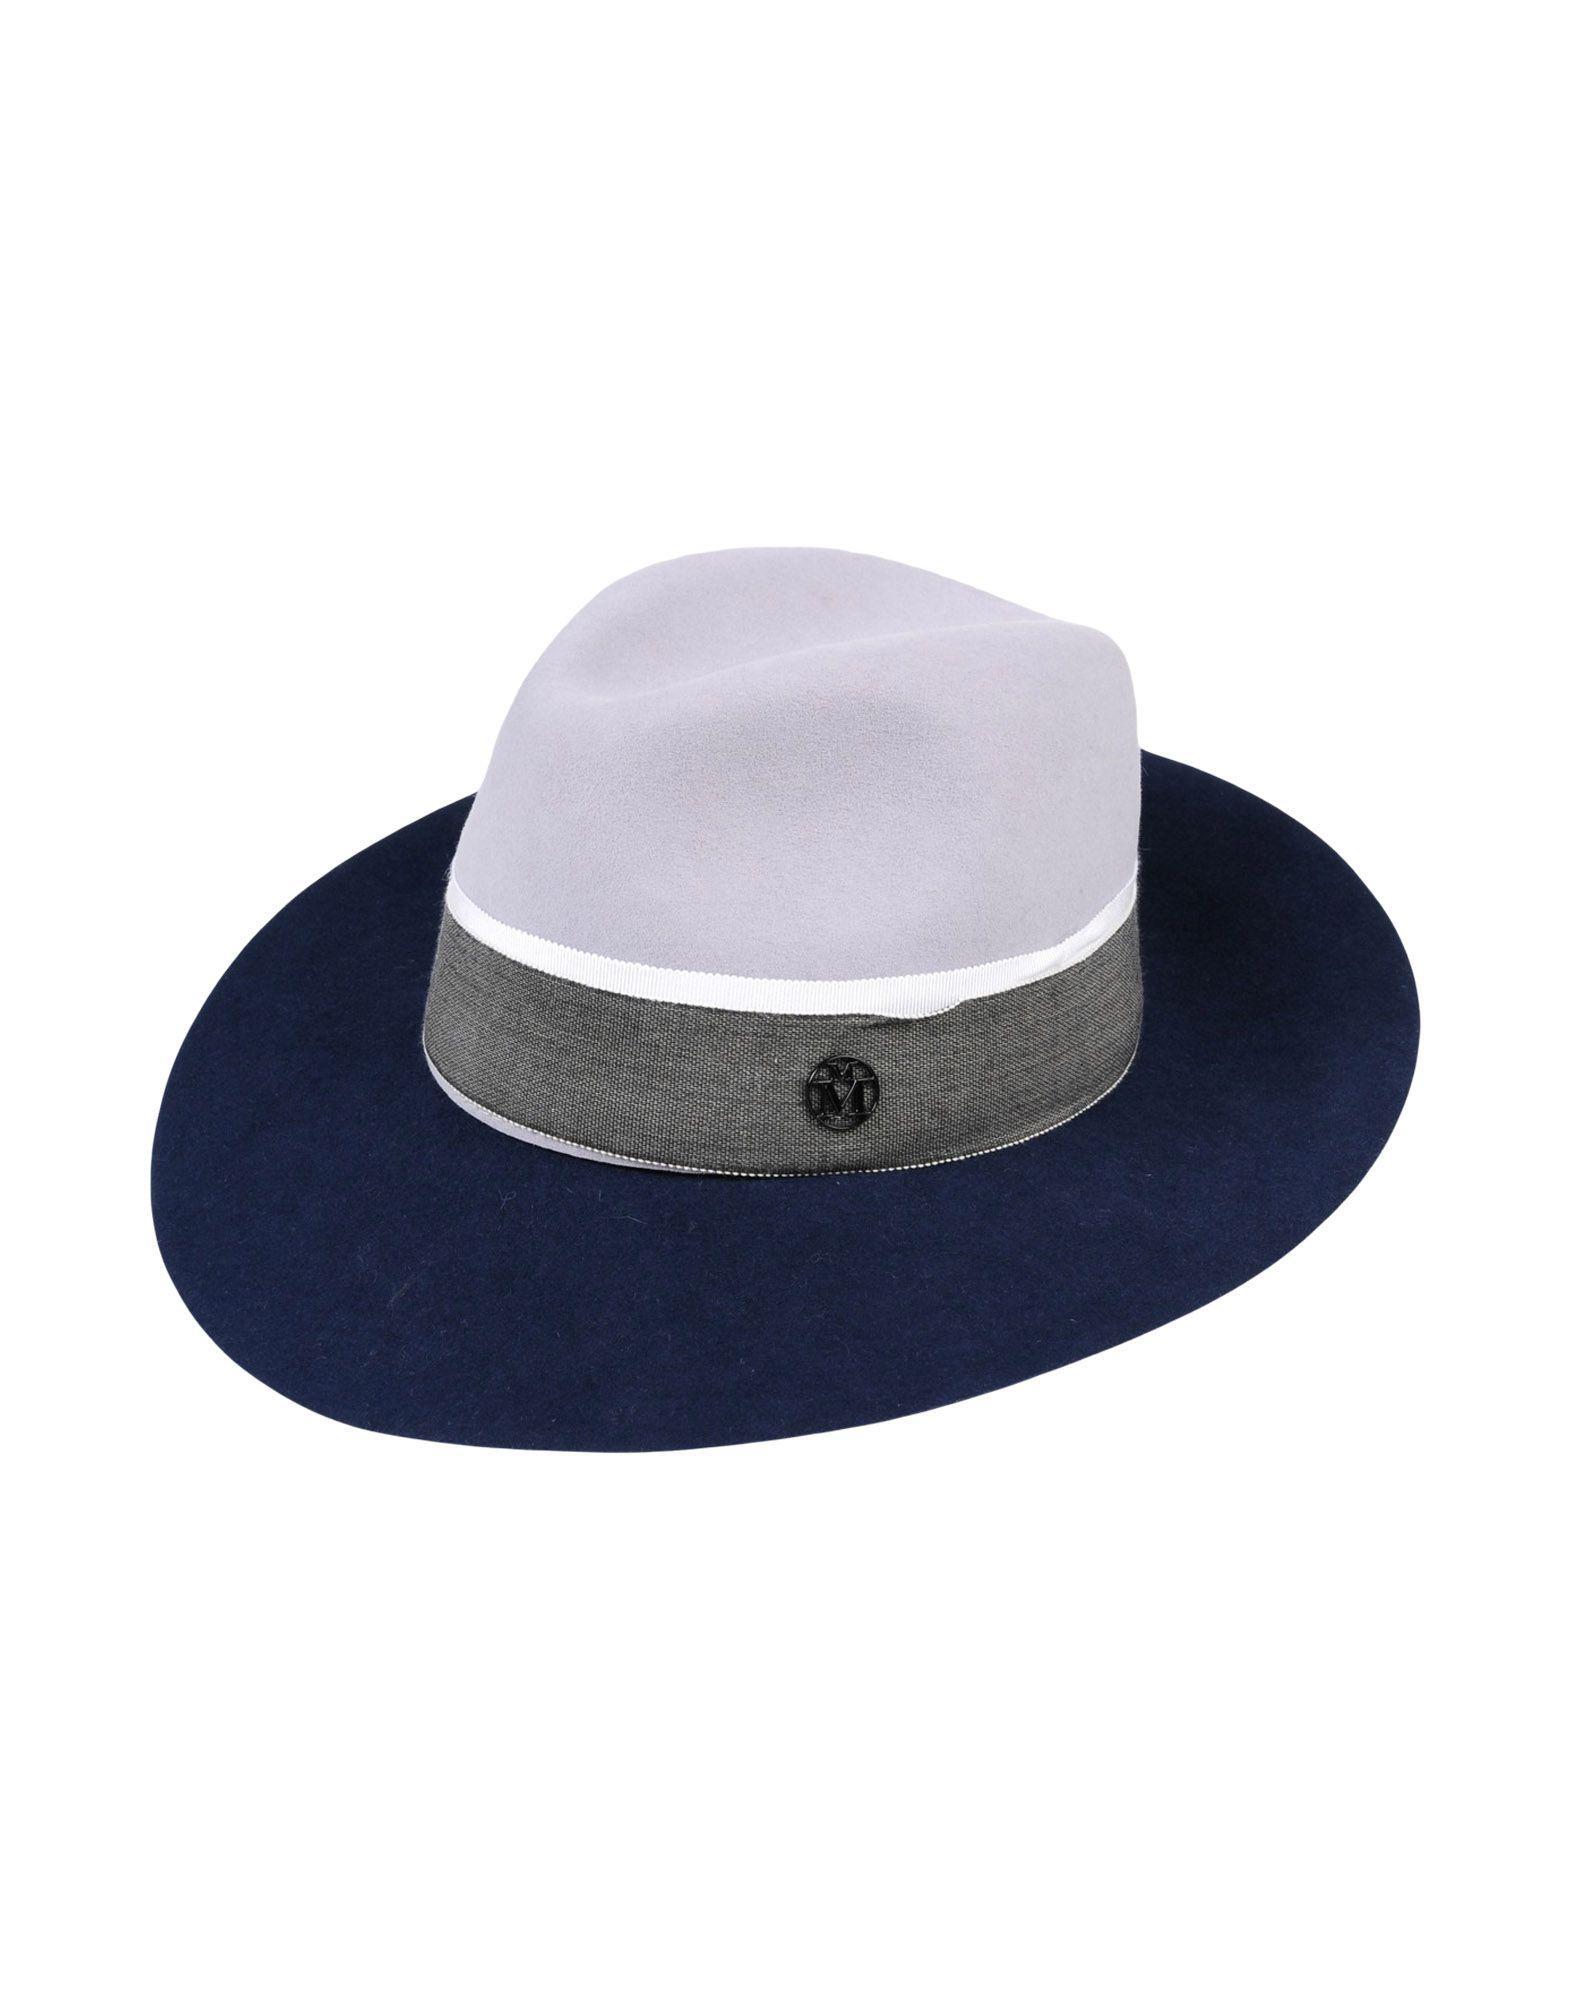 Maison Michel Hats In Light Grey